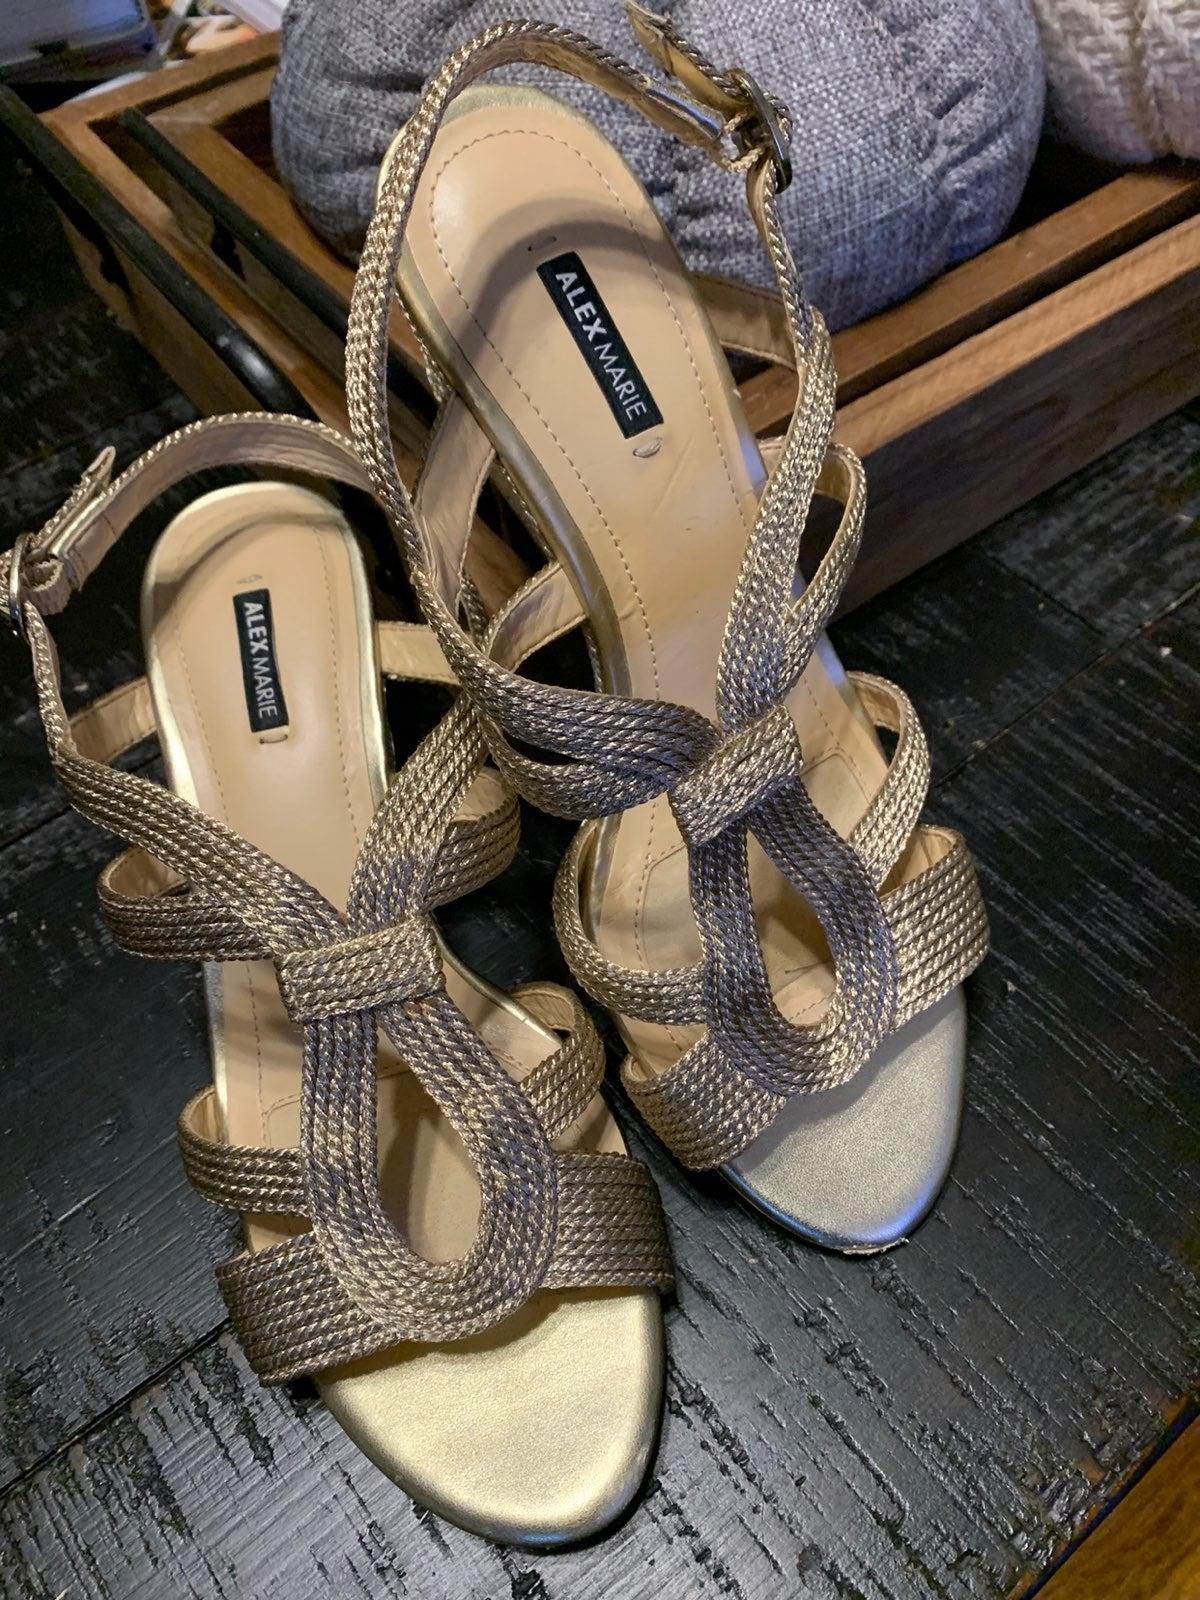 womens shoes 8.5.  Gold sandals. Alex Ma